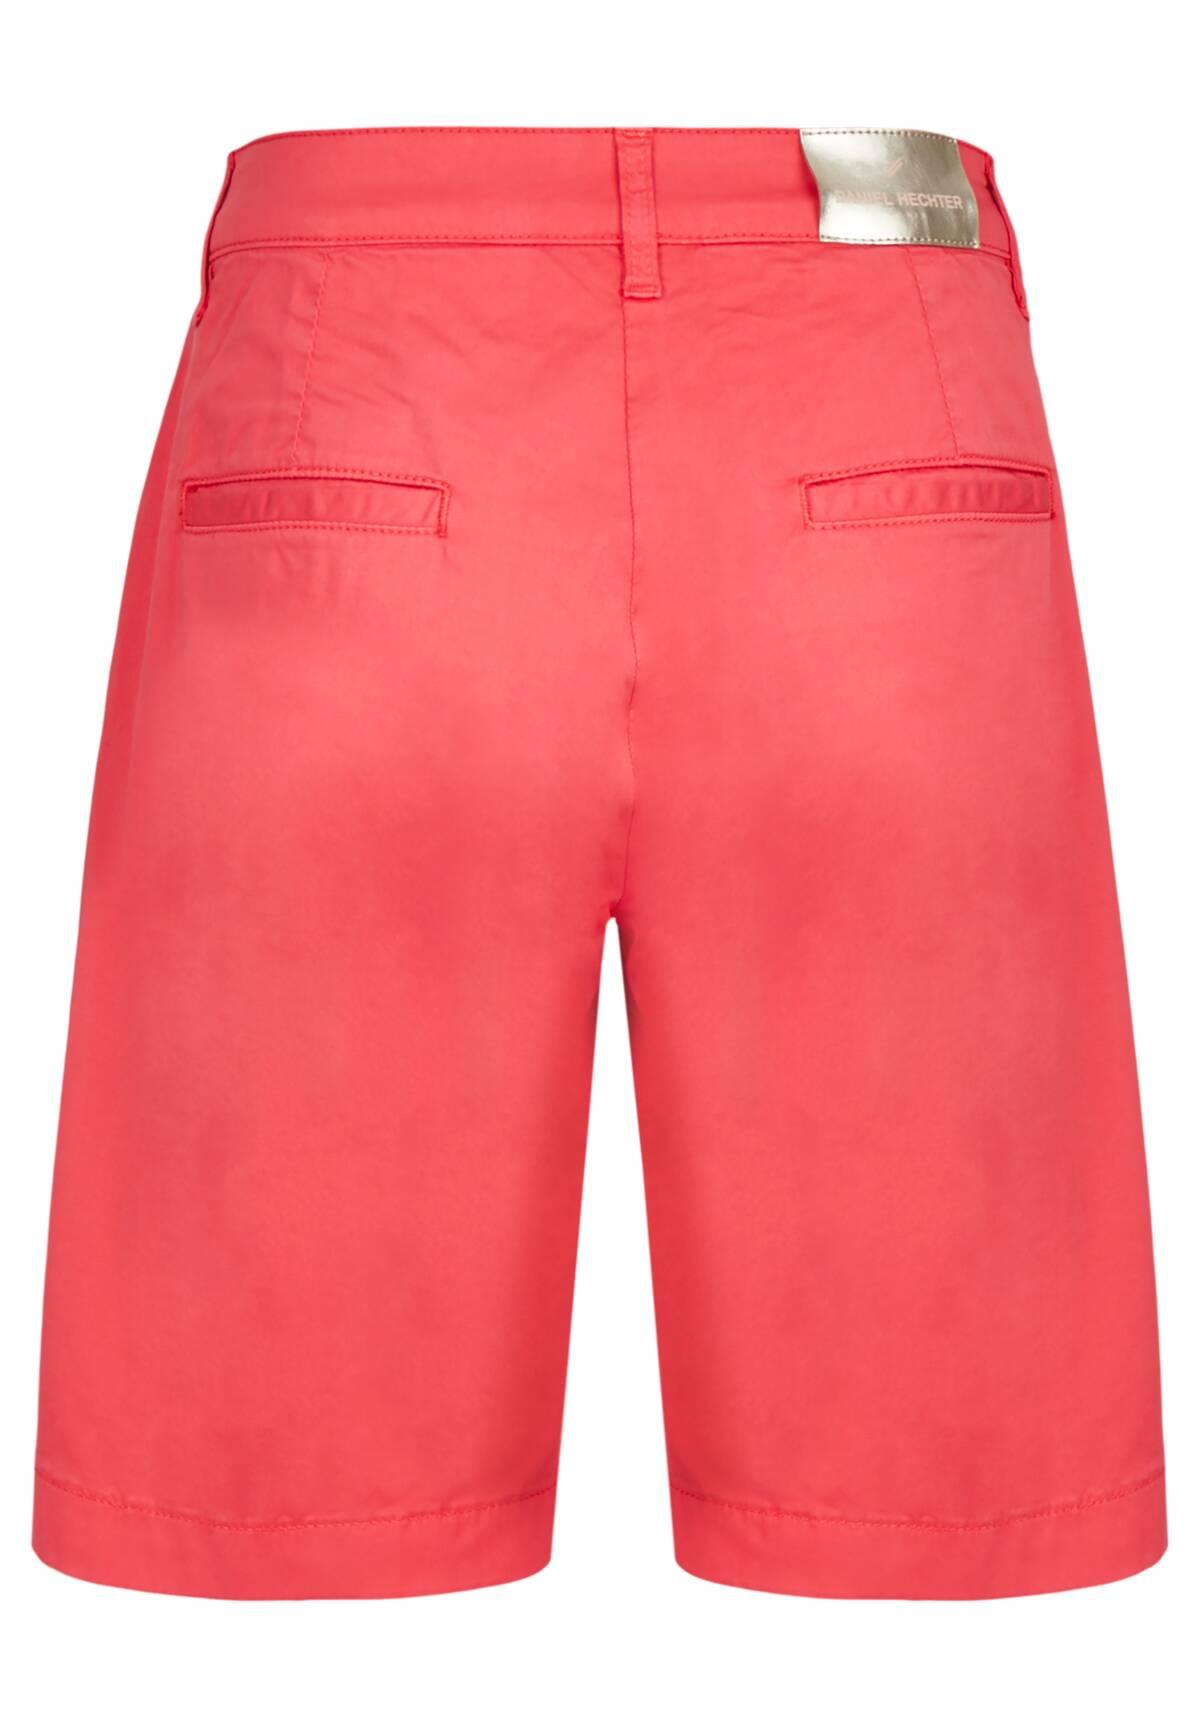 Sommerliche Shorts / Bermuda